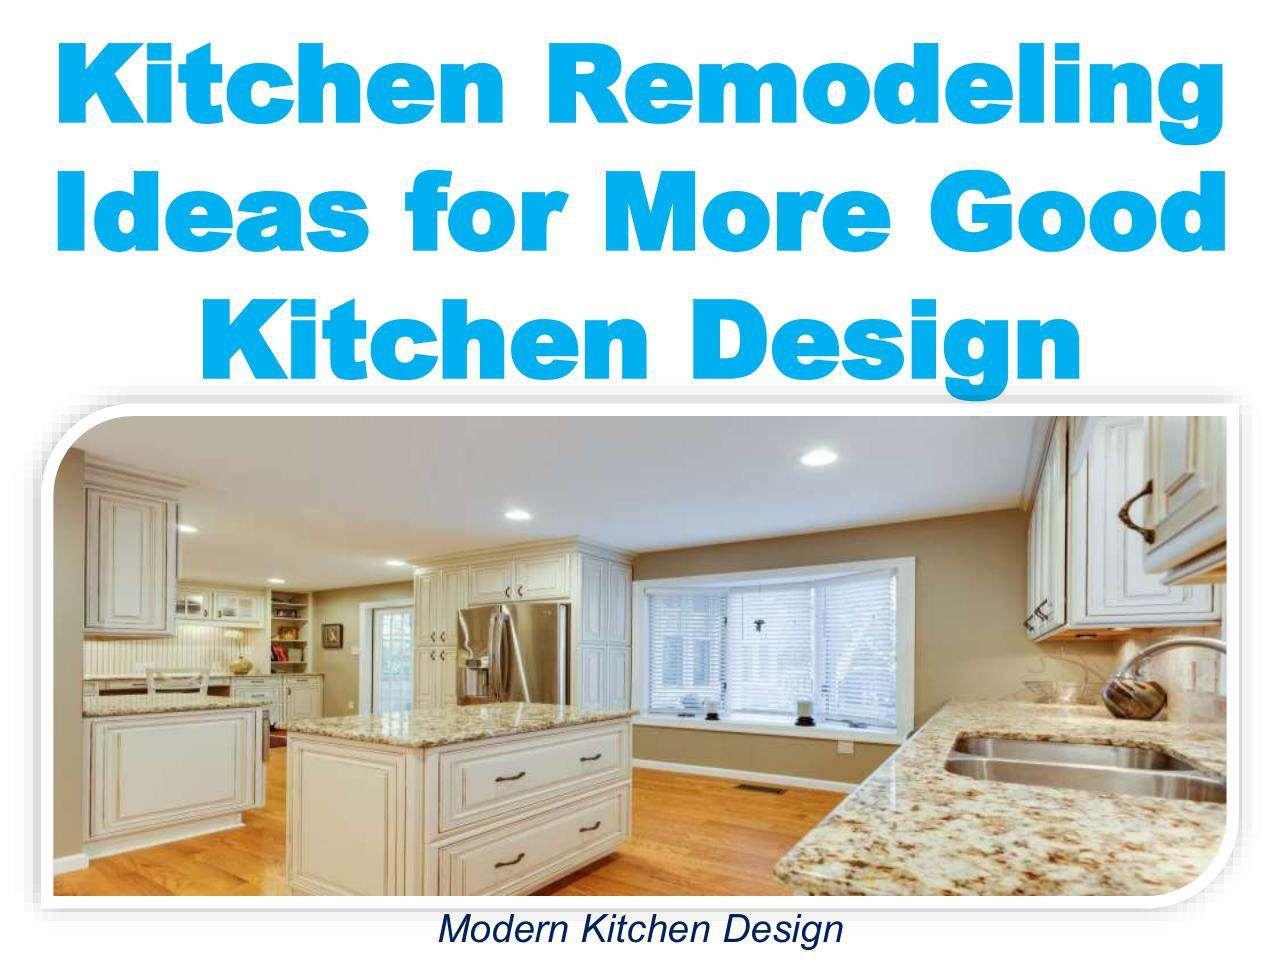 Kitchen Remodeling Ideas for More Good Kitchen Design | Kitchen ...